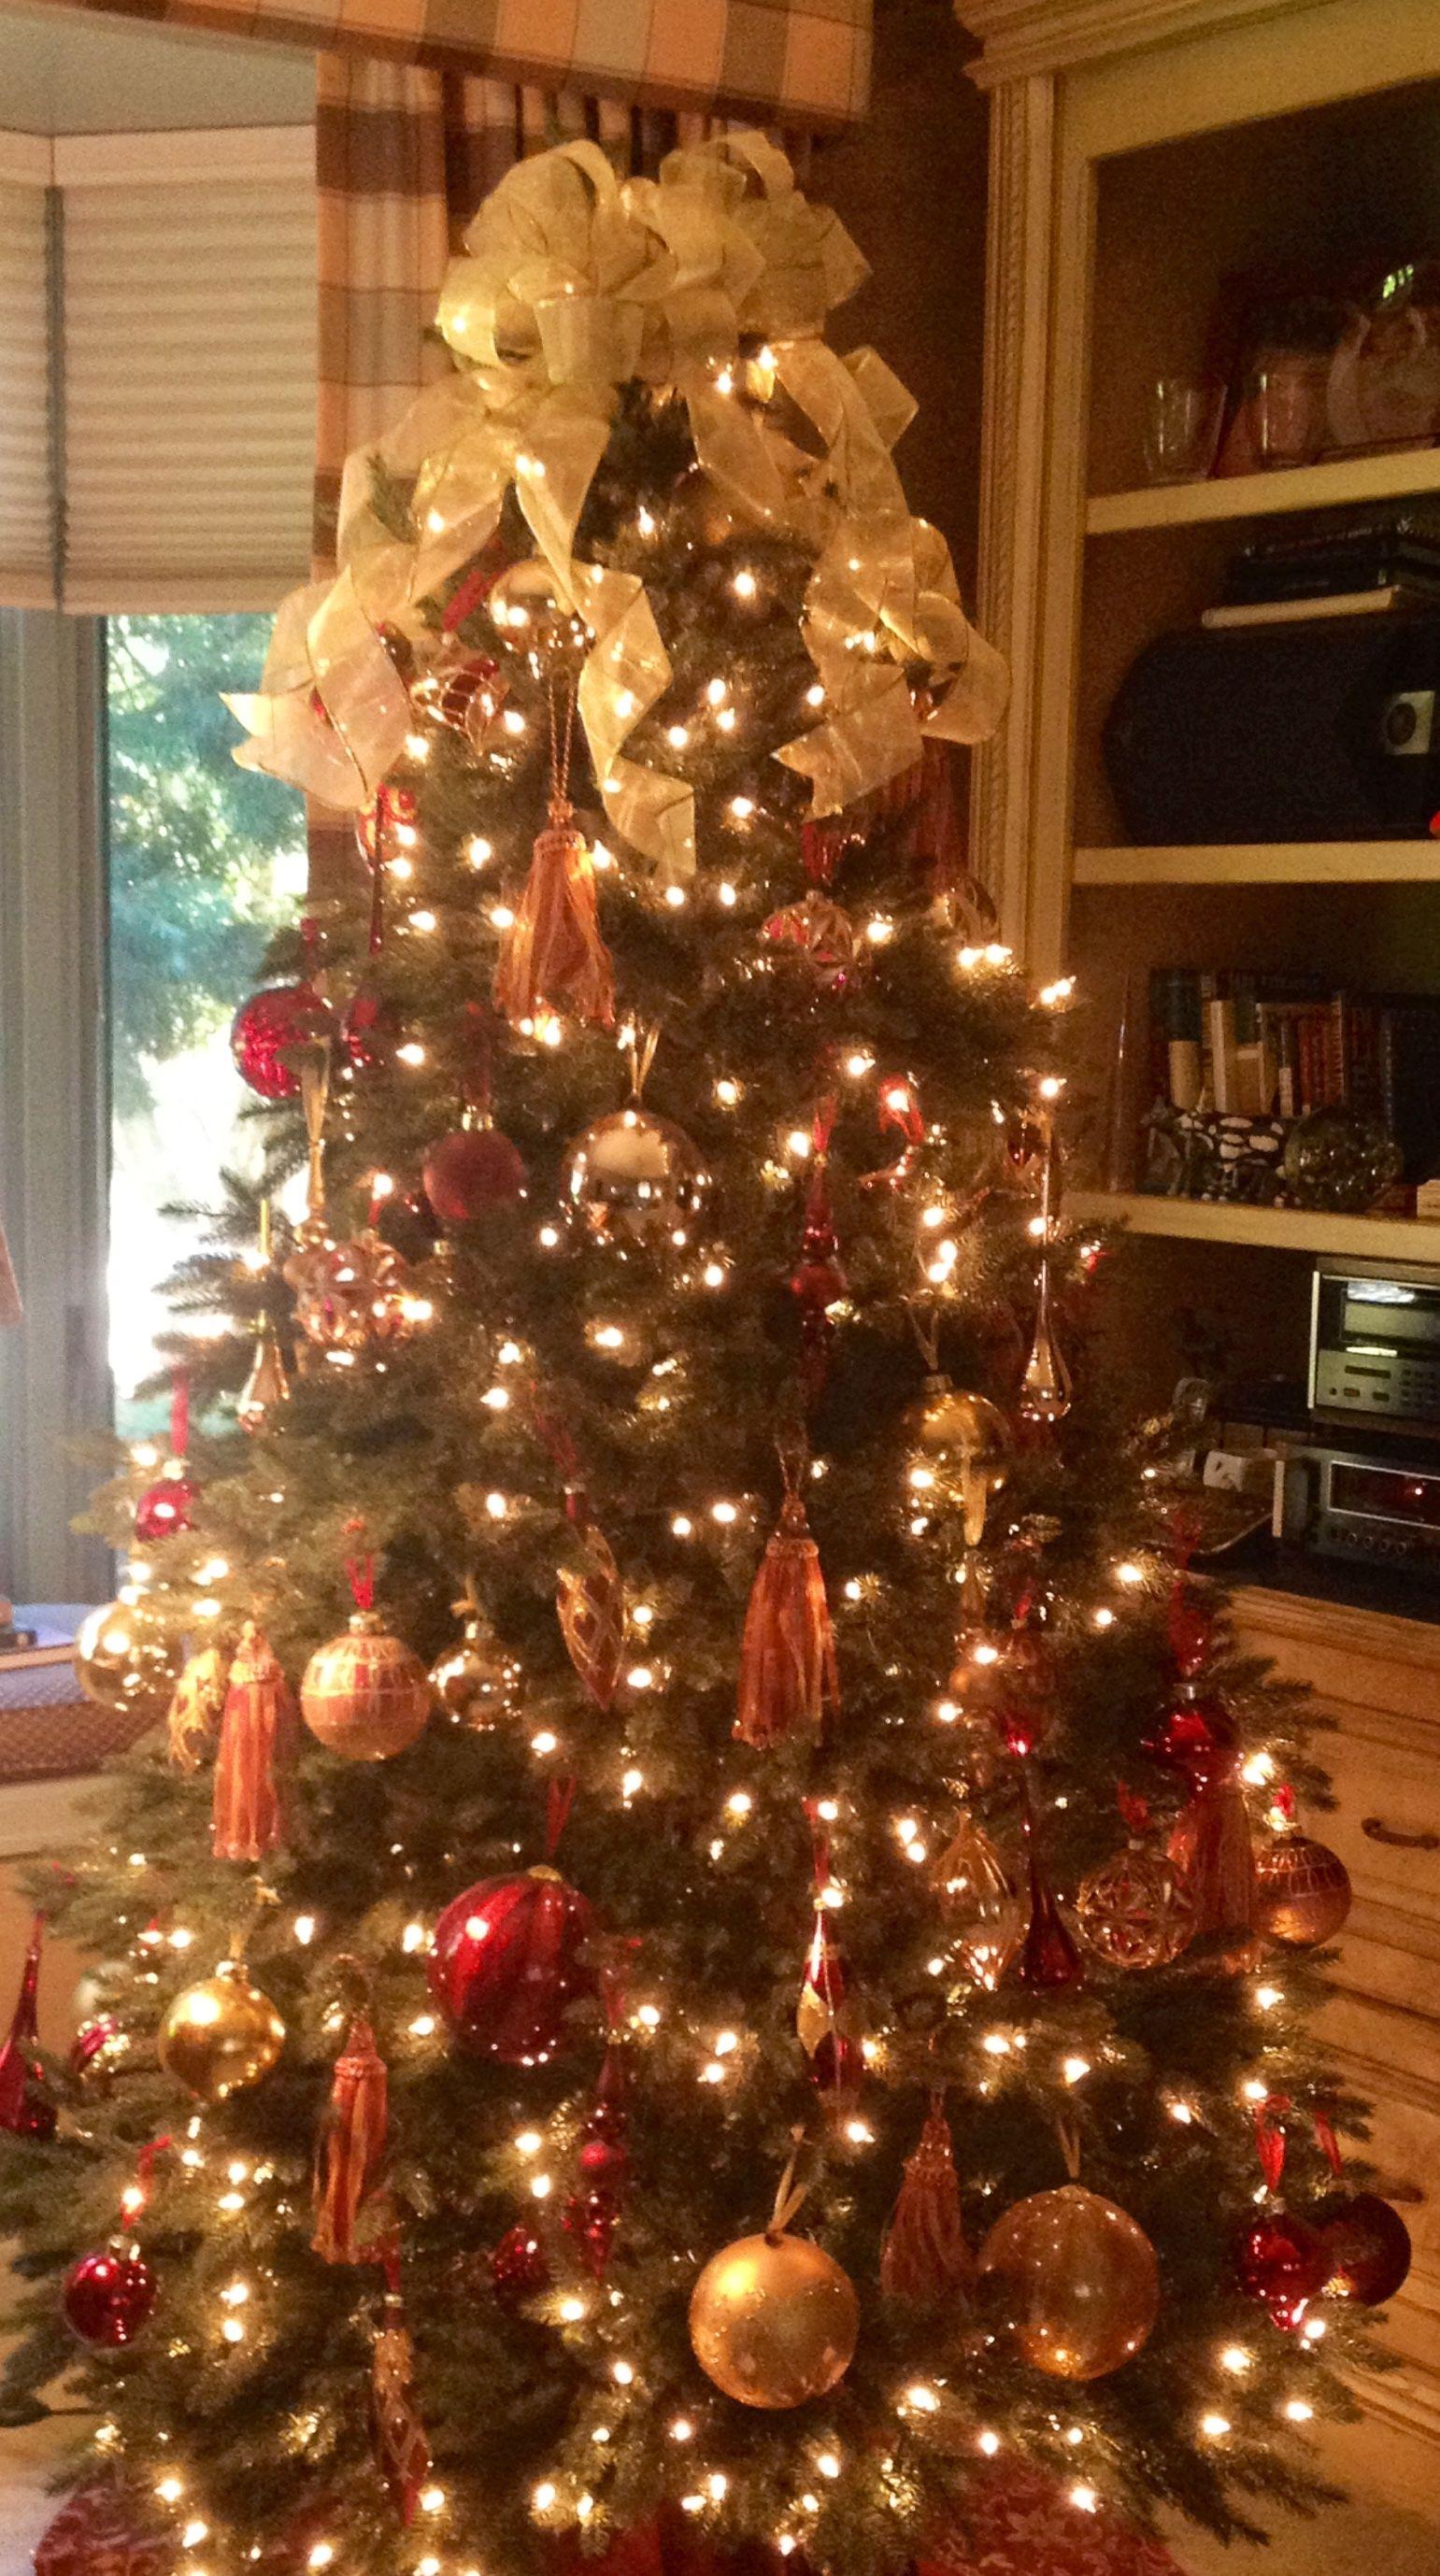 Christmas Crafts, Crafting, Craft, Crafts To Make, Crafts, Xmas Crafts,